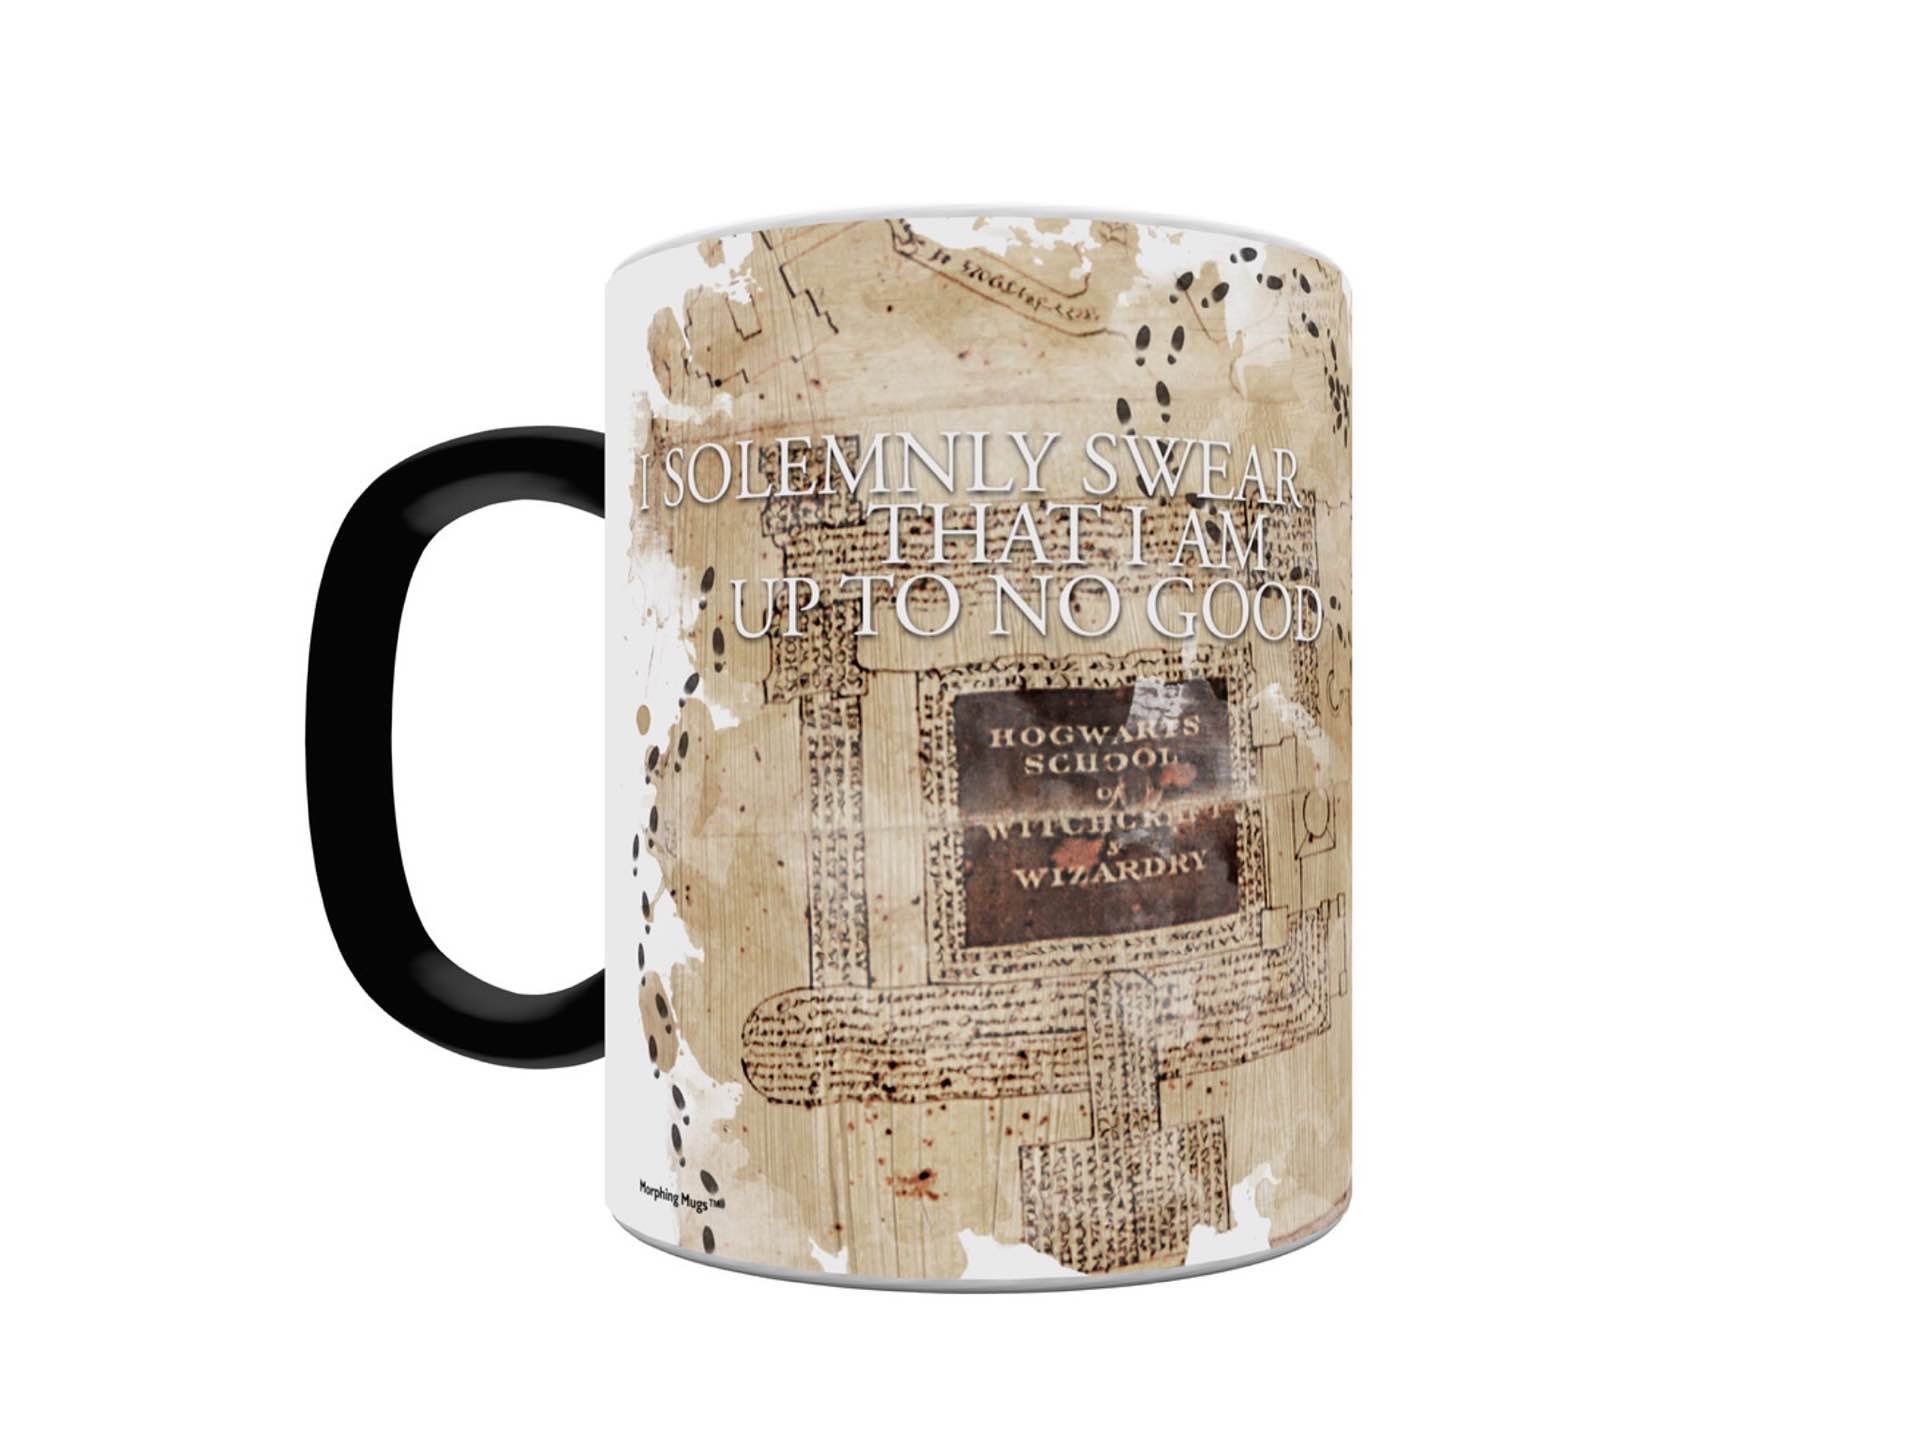 %name Mischief Managed Coffee Mug Harry Potter Mischief Managed Coffee Mug